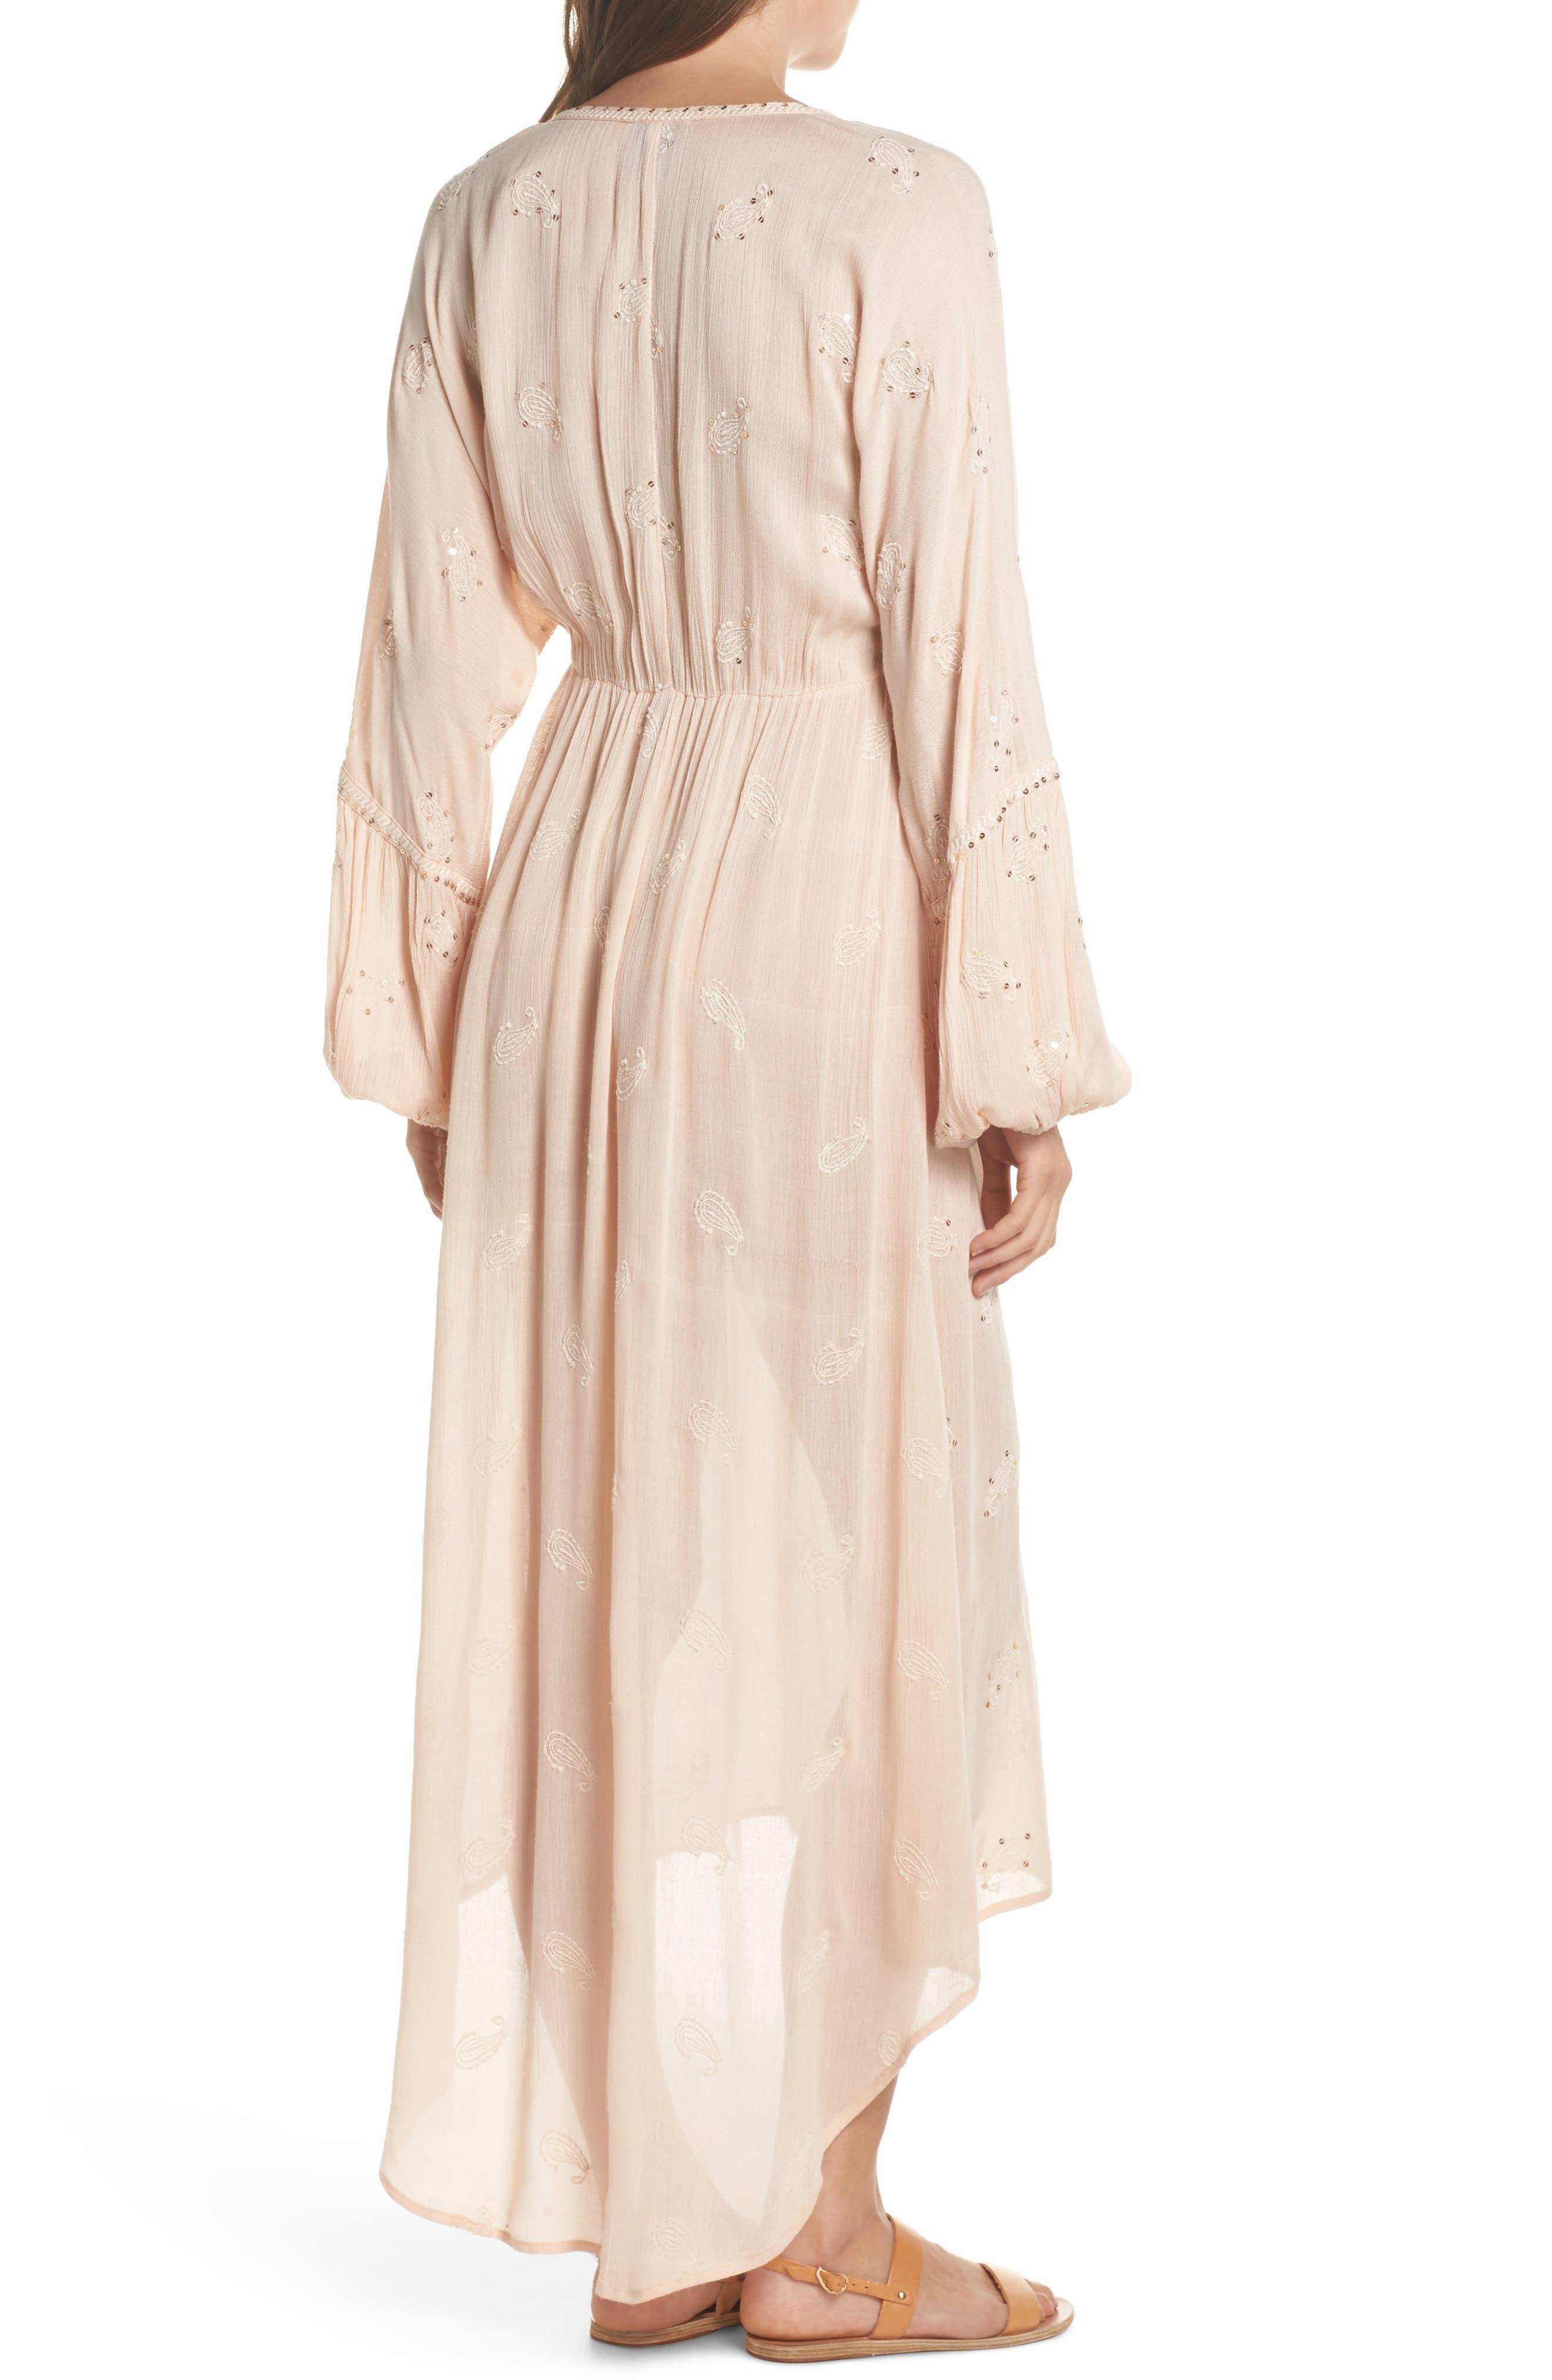 Mercer Cover-Up Maxi Dress,                             Alternate thumbnail 2, color,                             650